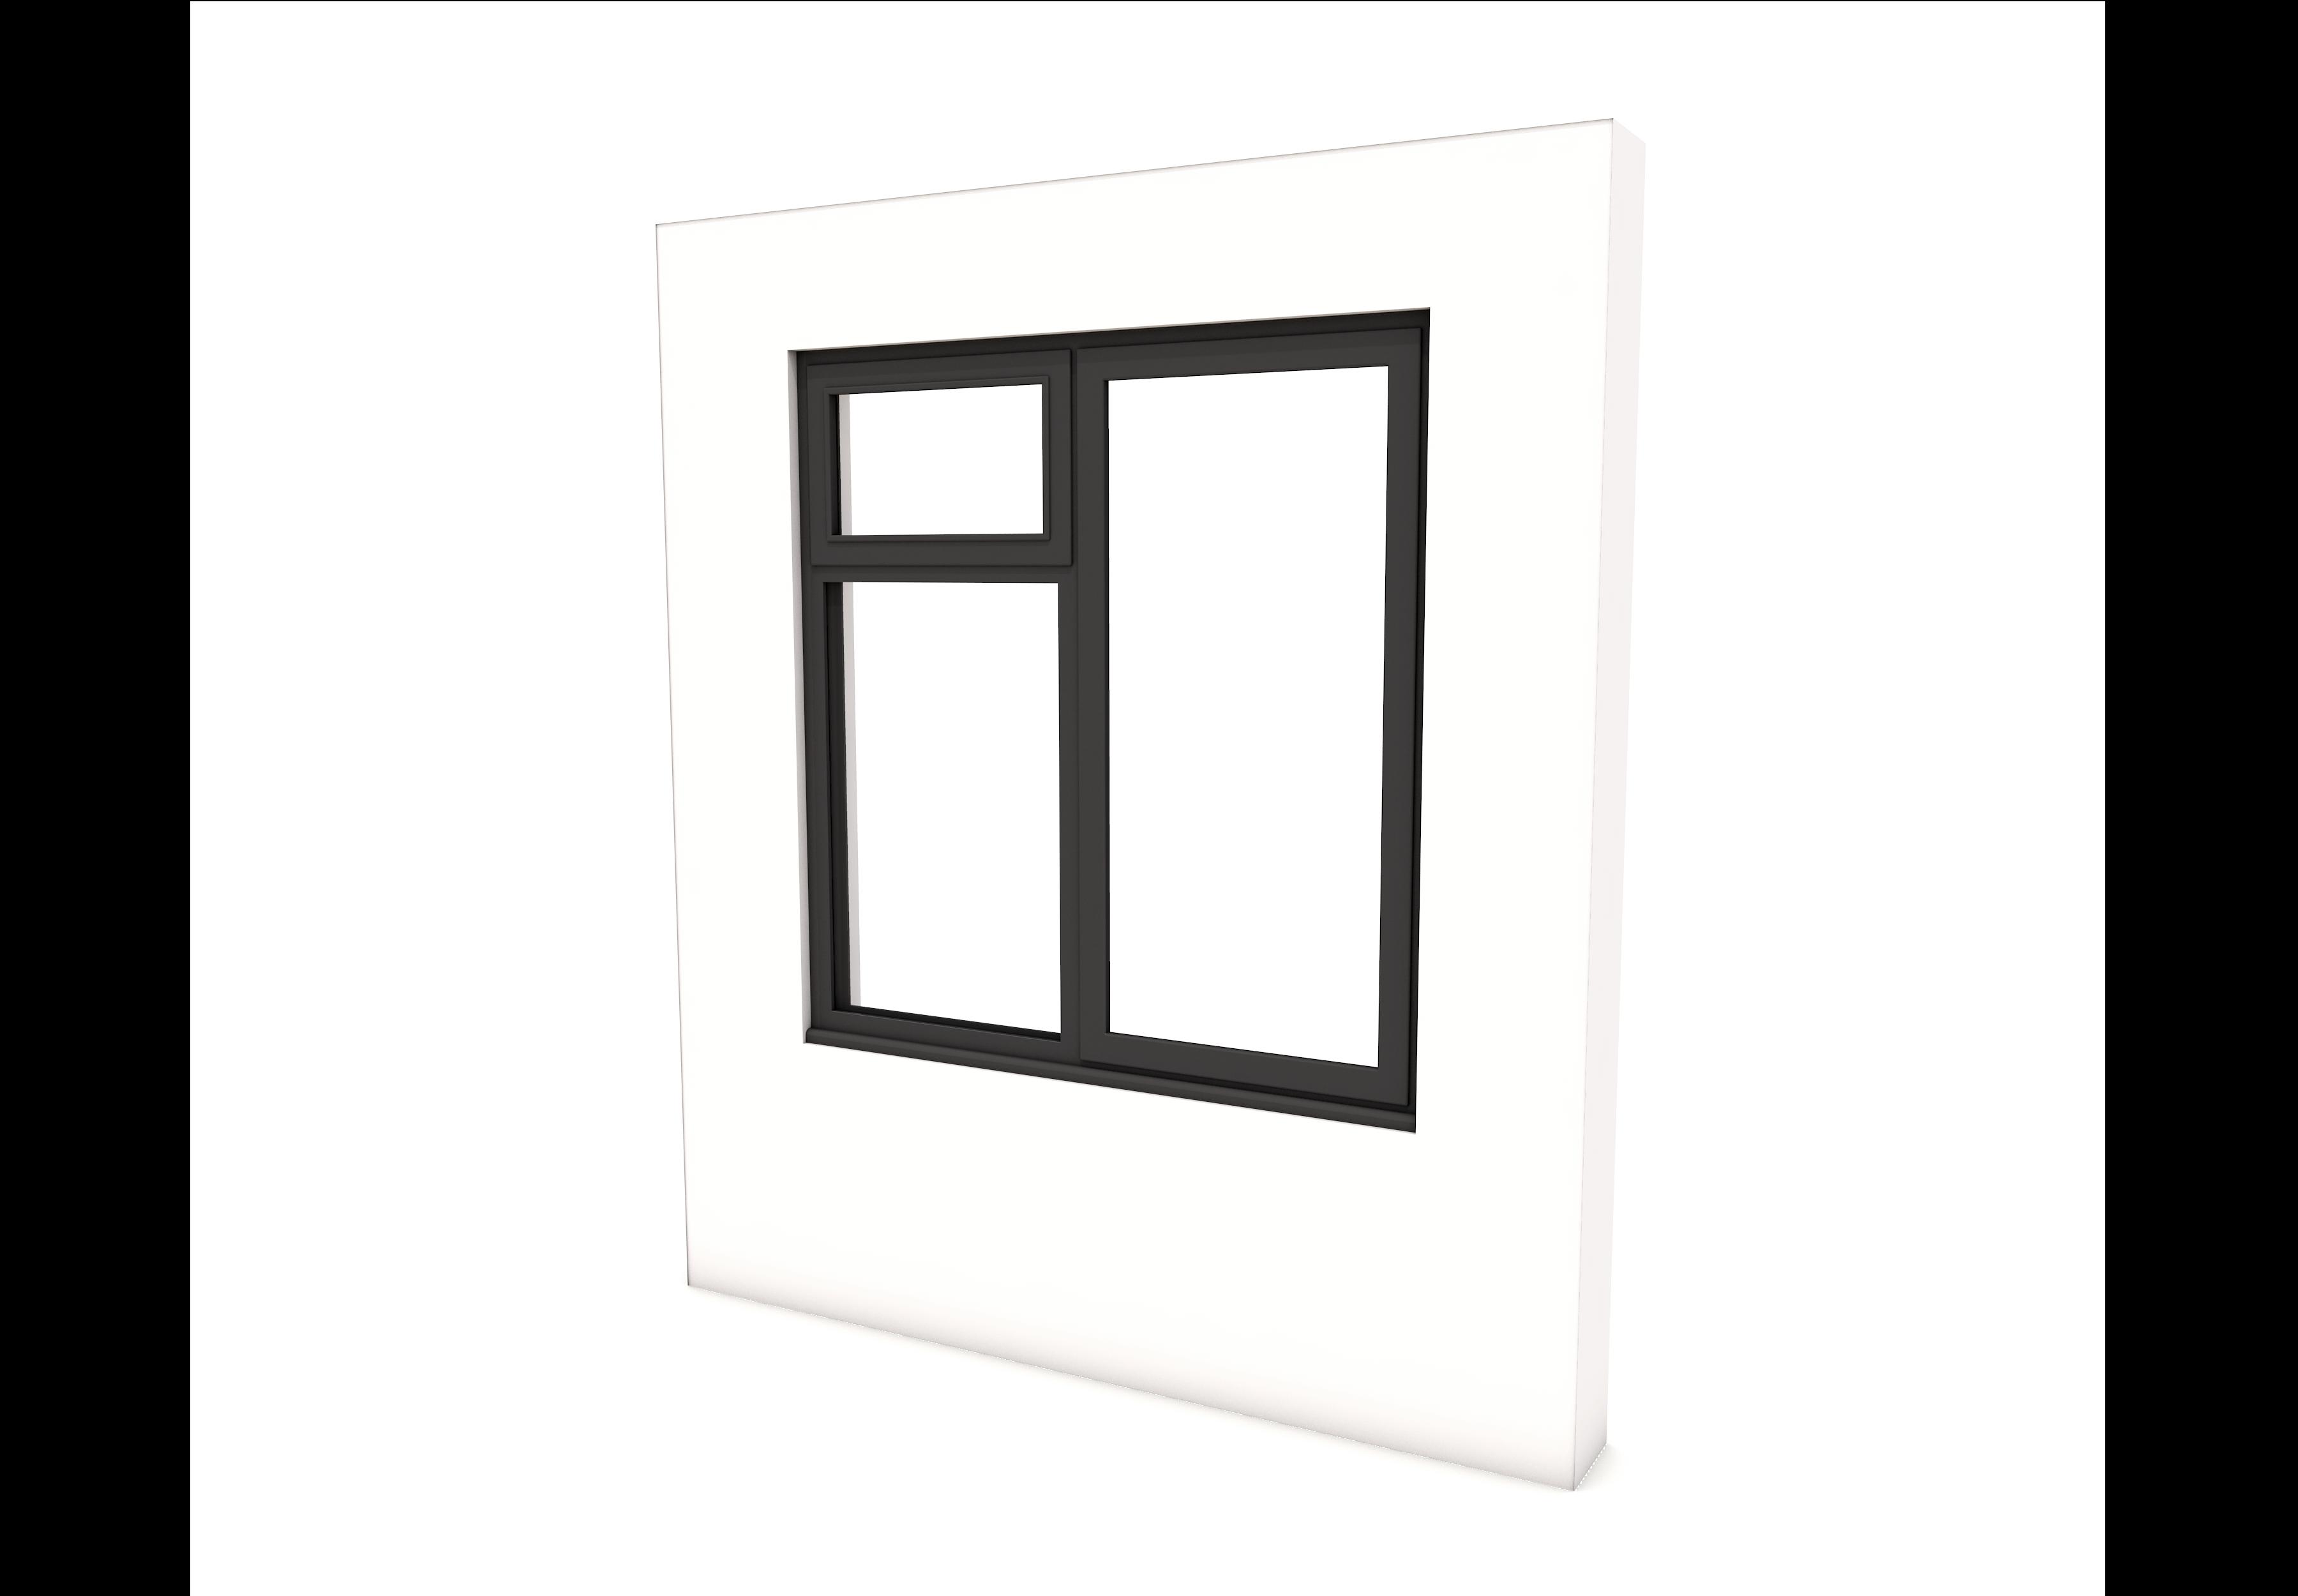 Smart Alitherm 300 Window - 1200 x 1200 mm - Left Bottom Fixed